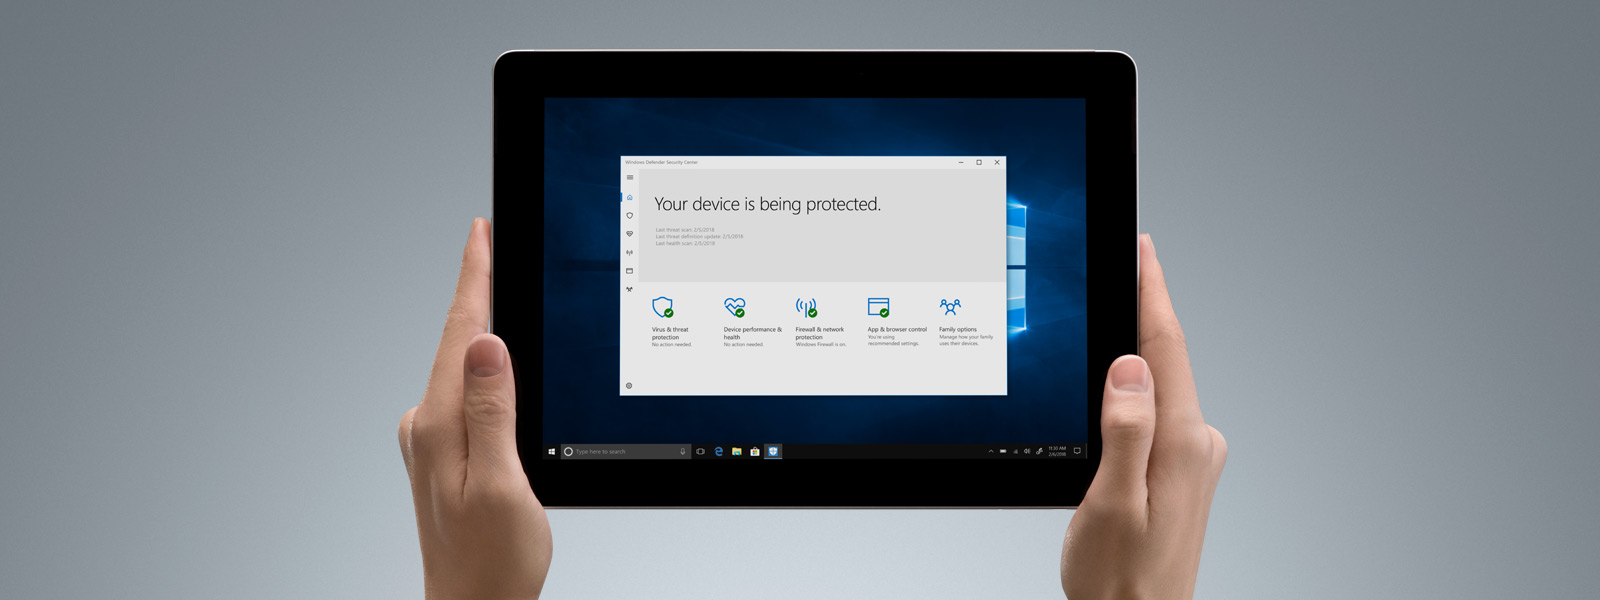 Surface Go ถูกถือในแบบแท็บเล็ต พร้อม Windows Defender